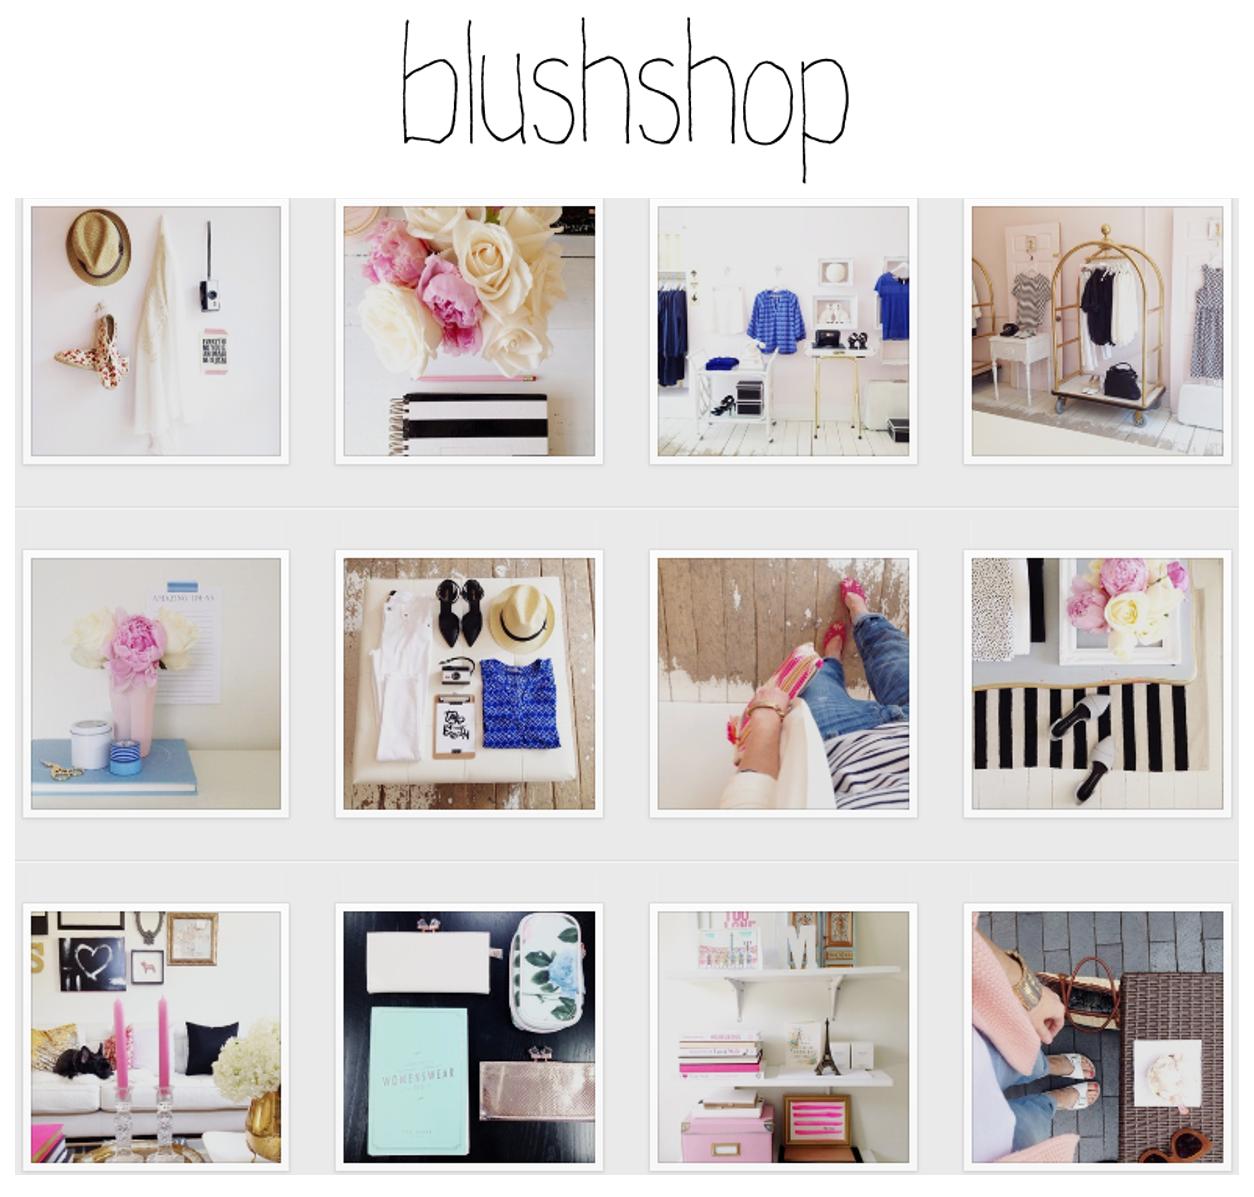 blushshop